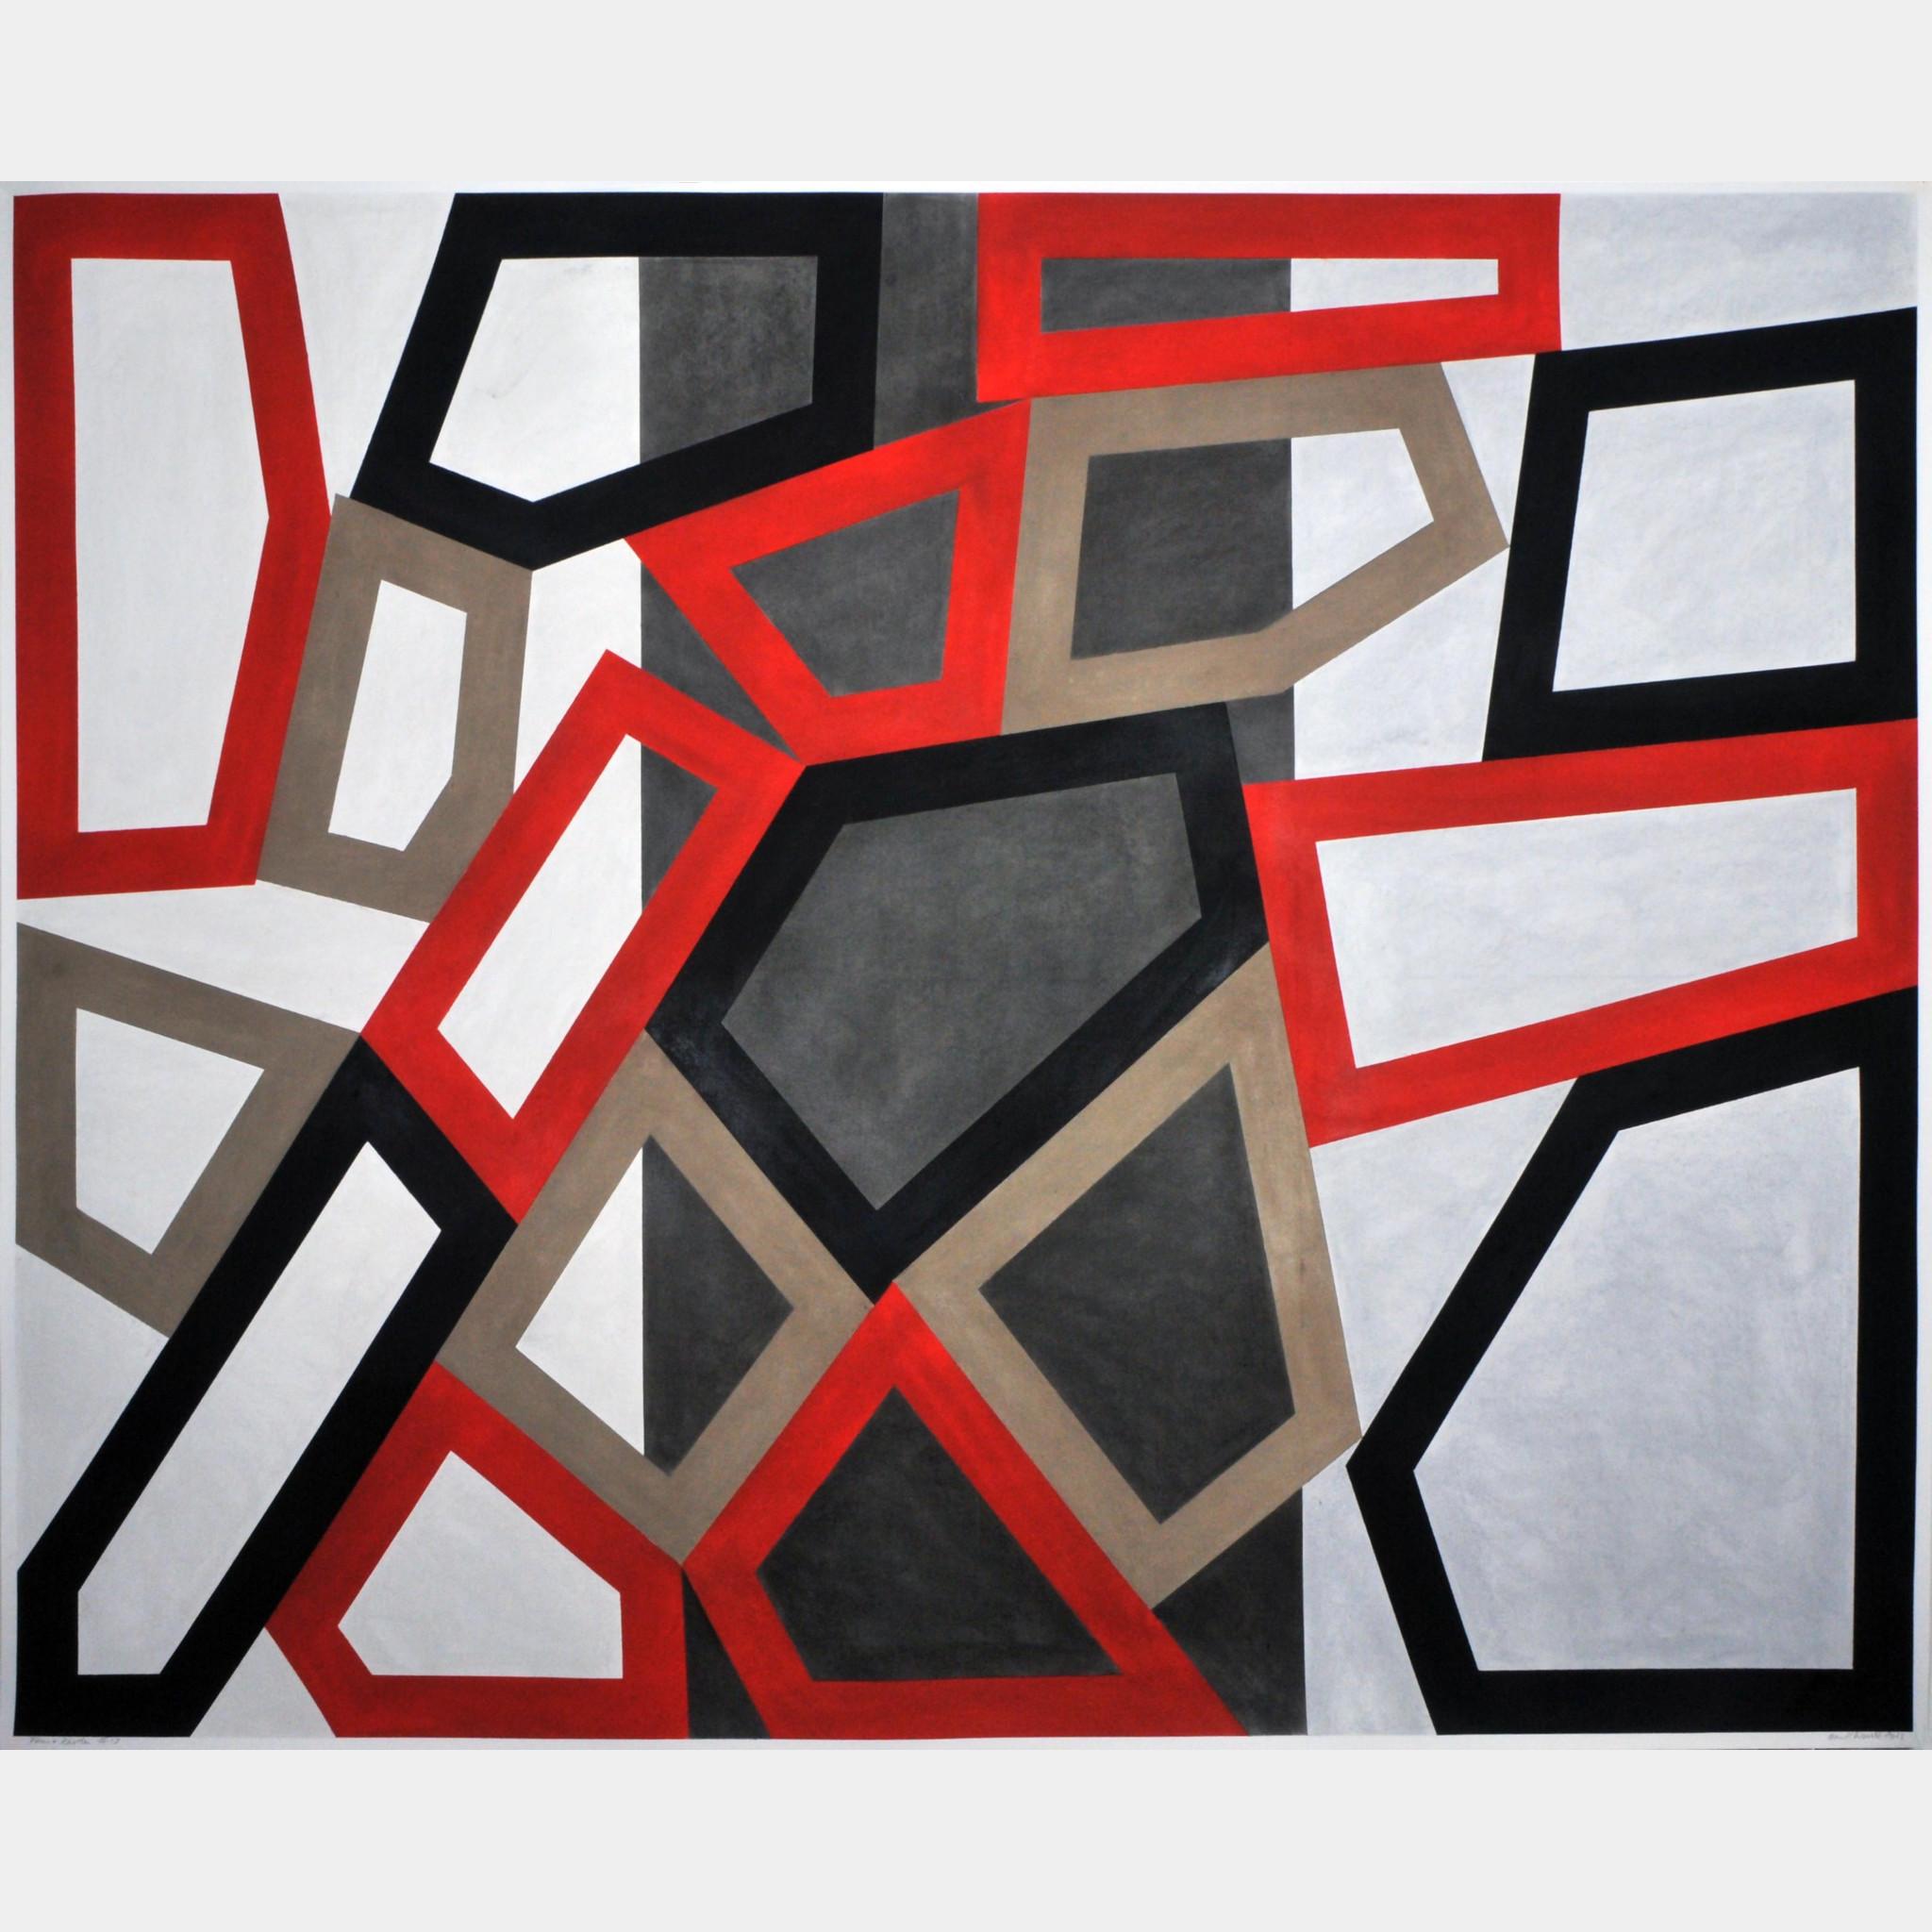 david tremlett | form and rhythm #13 | art basel